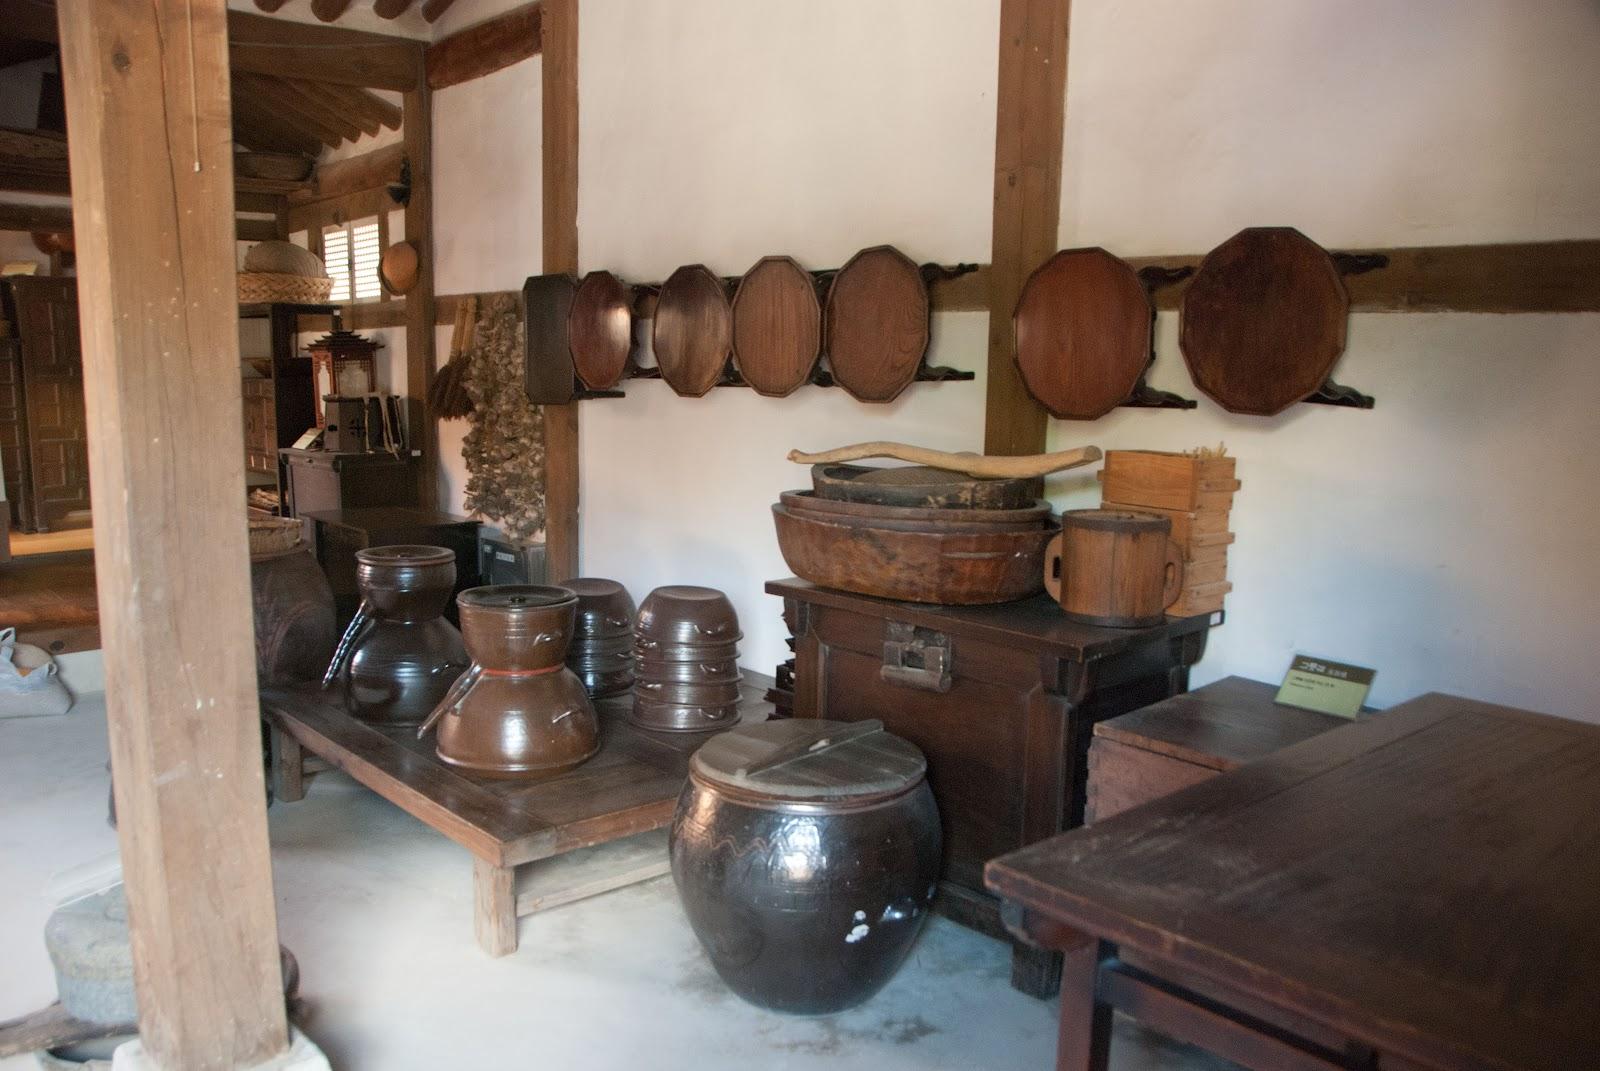 Doc trapho namsangol hanok village south korea for Traditional korean kitchen